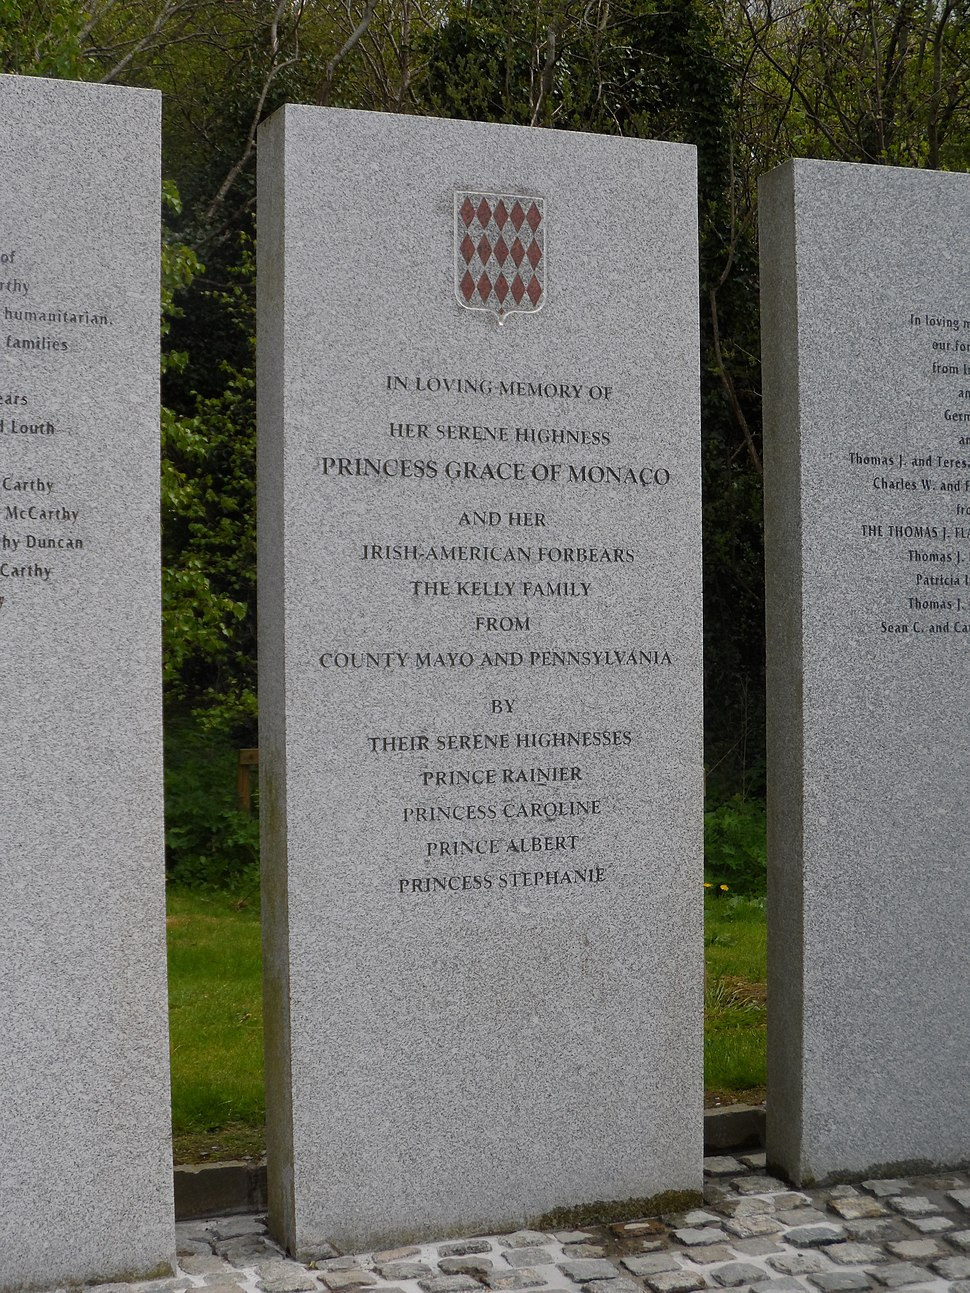 Grace Kelly memorial, Maynooth